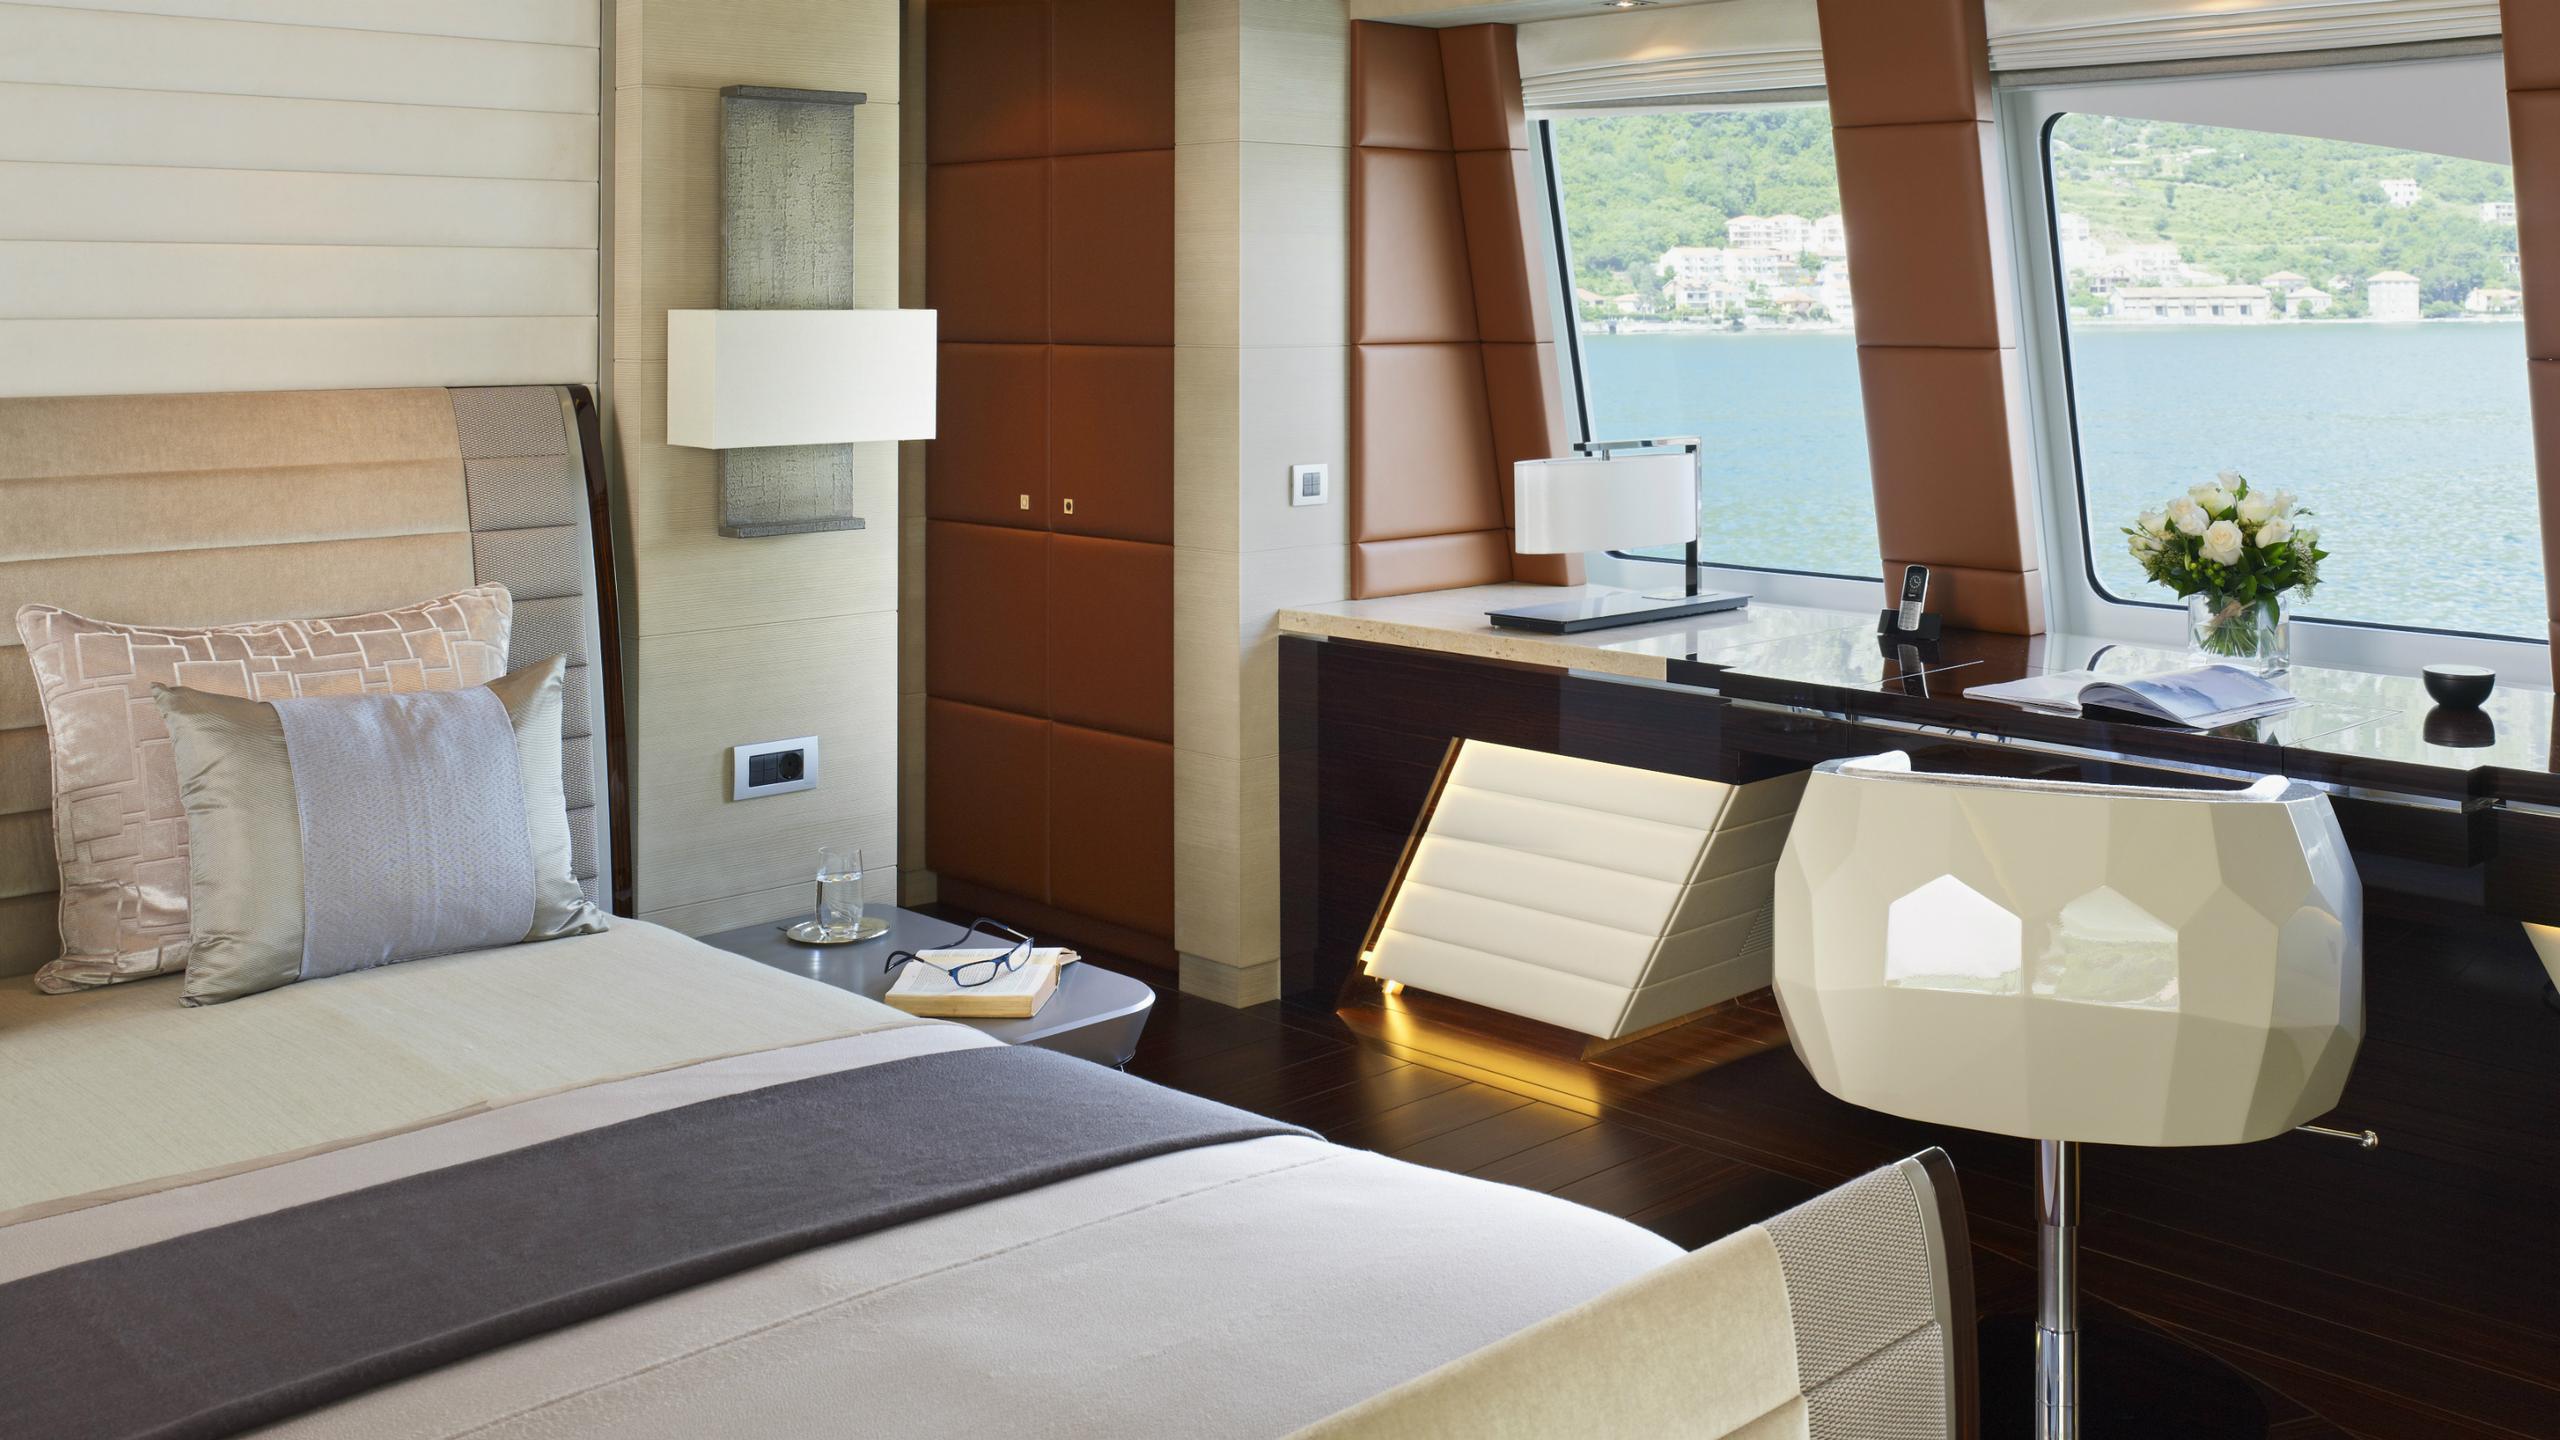 odyssea-como-lady-petra-motor-yacht-heesen-2012-47m-cabin